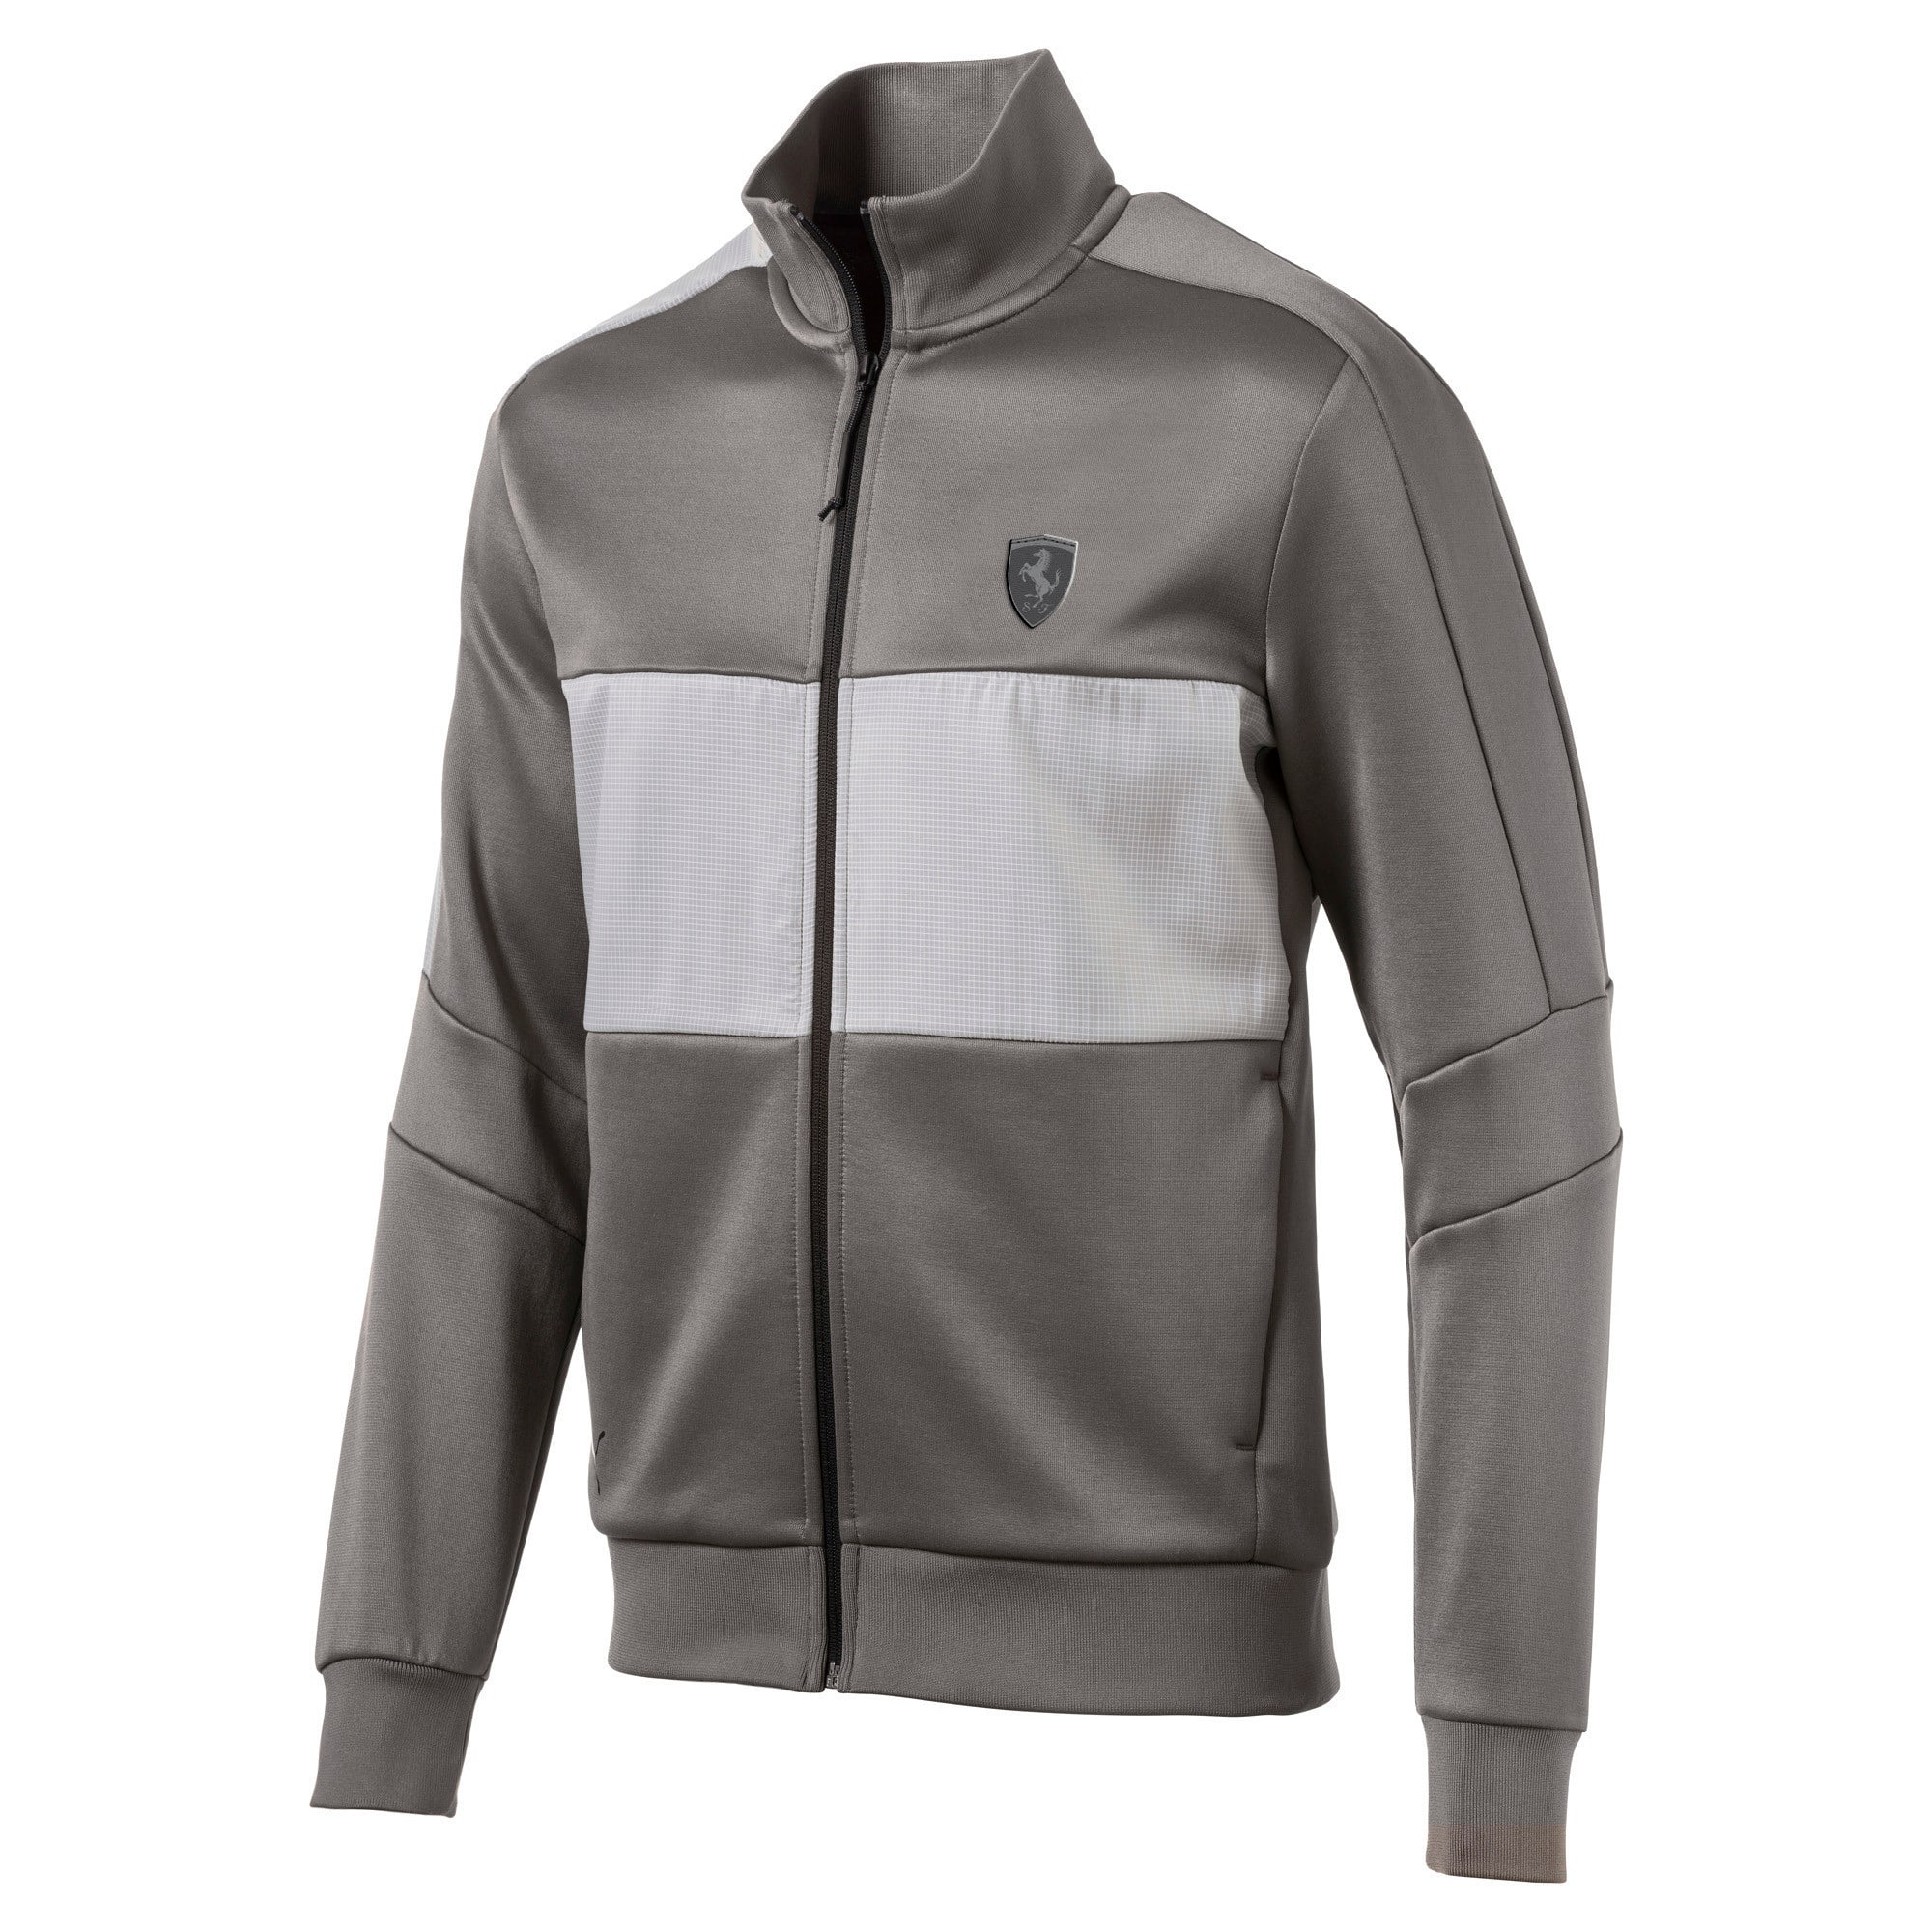 Thumbnail 1 of Ferrari T7 Men's Track Jacket, Charcoal Gray, medium-IND